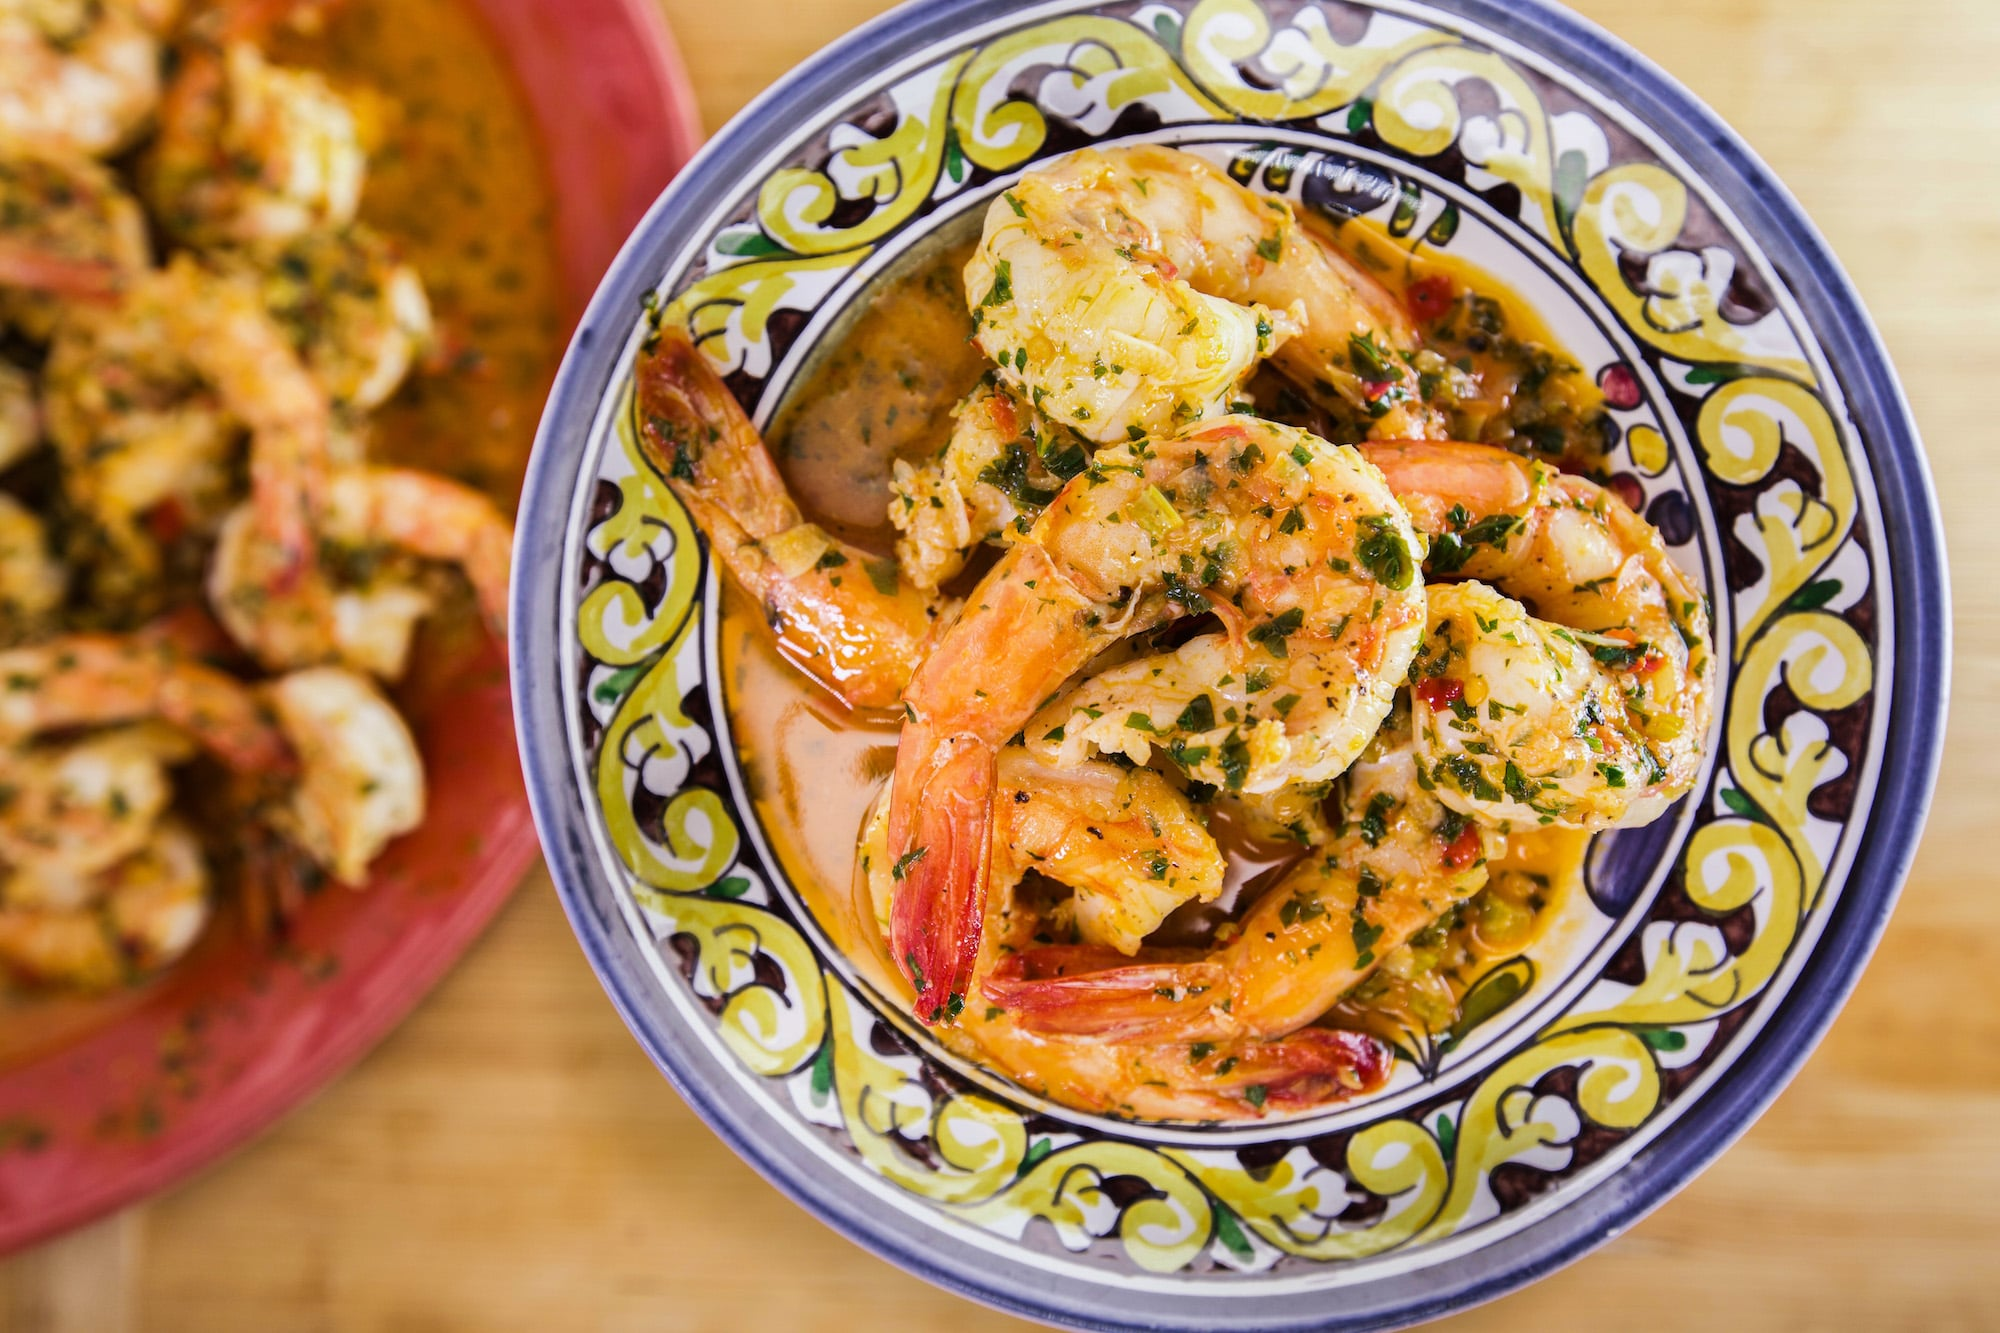 Rachael's Calabrian-Style Shrimp Scampi